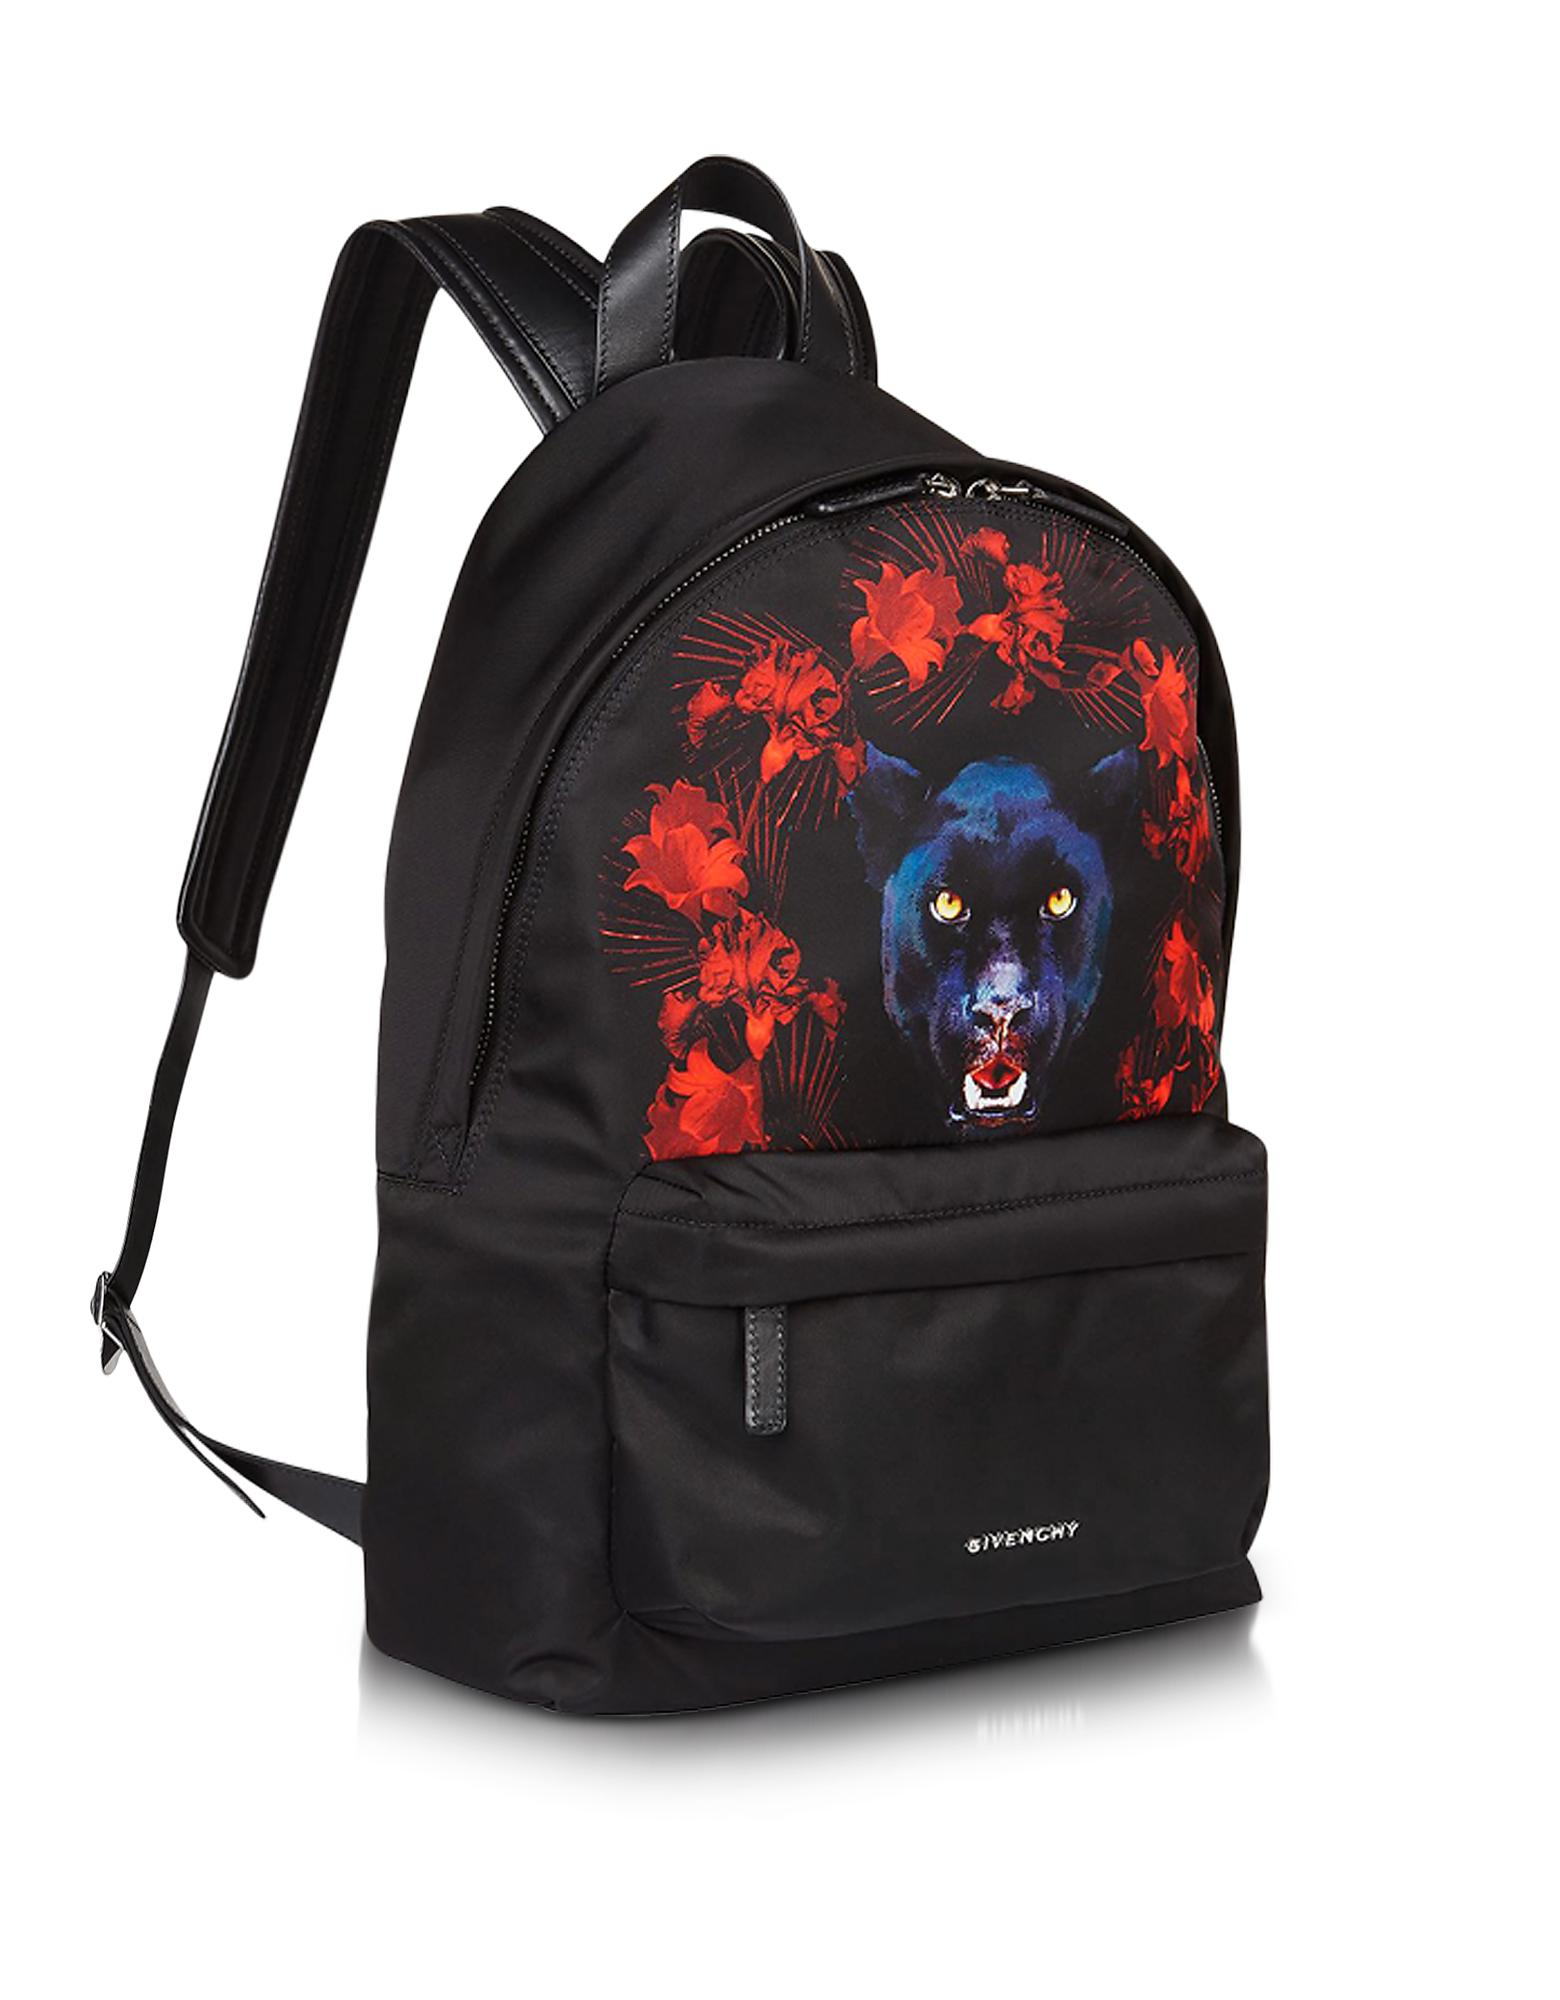 2454068ef858 Lyst - Givenchy Black Nylon Jaguar Printed Small Backpack .